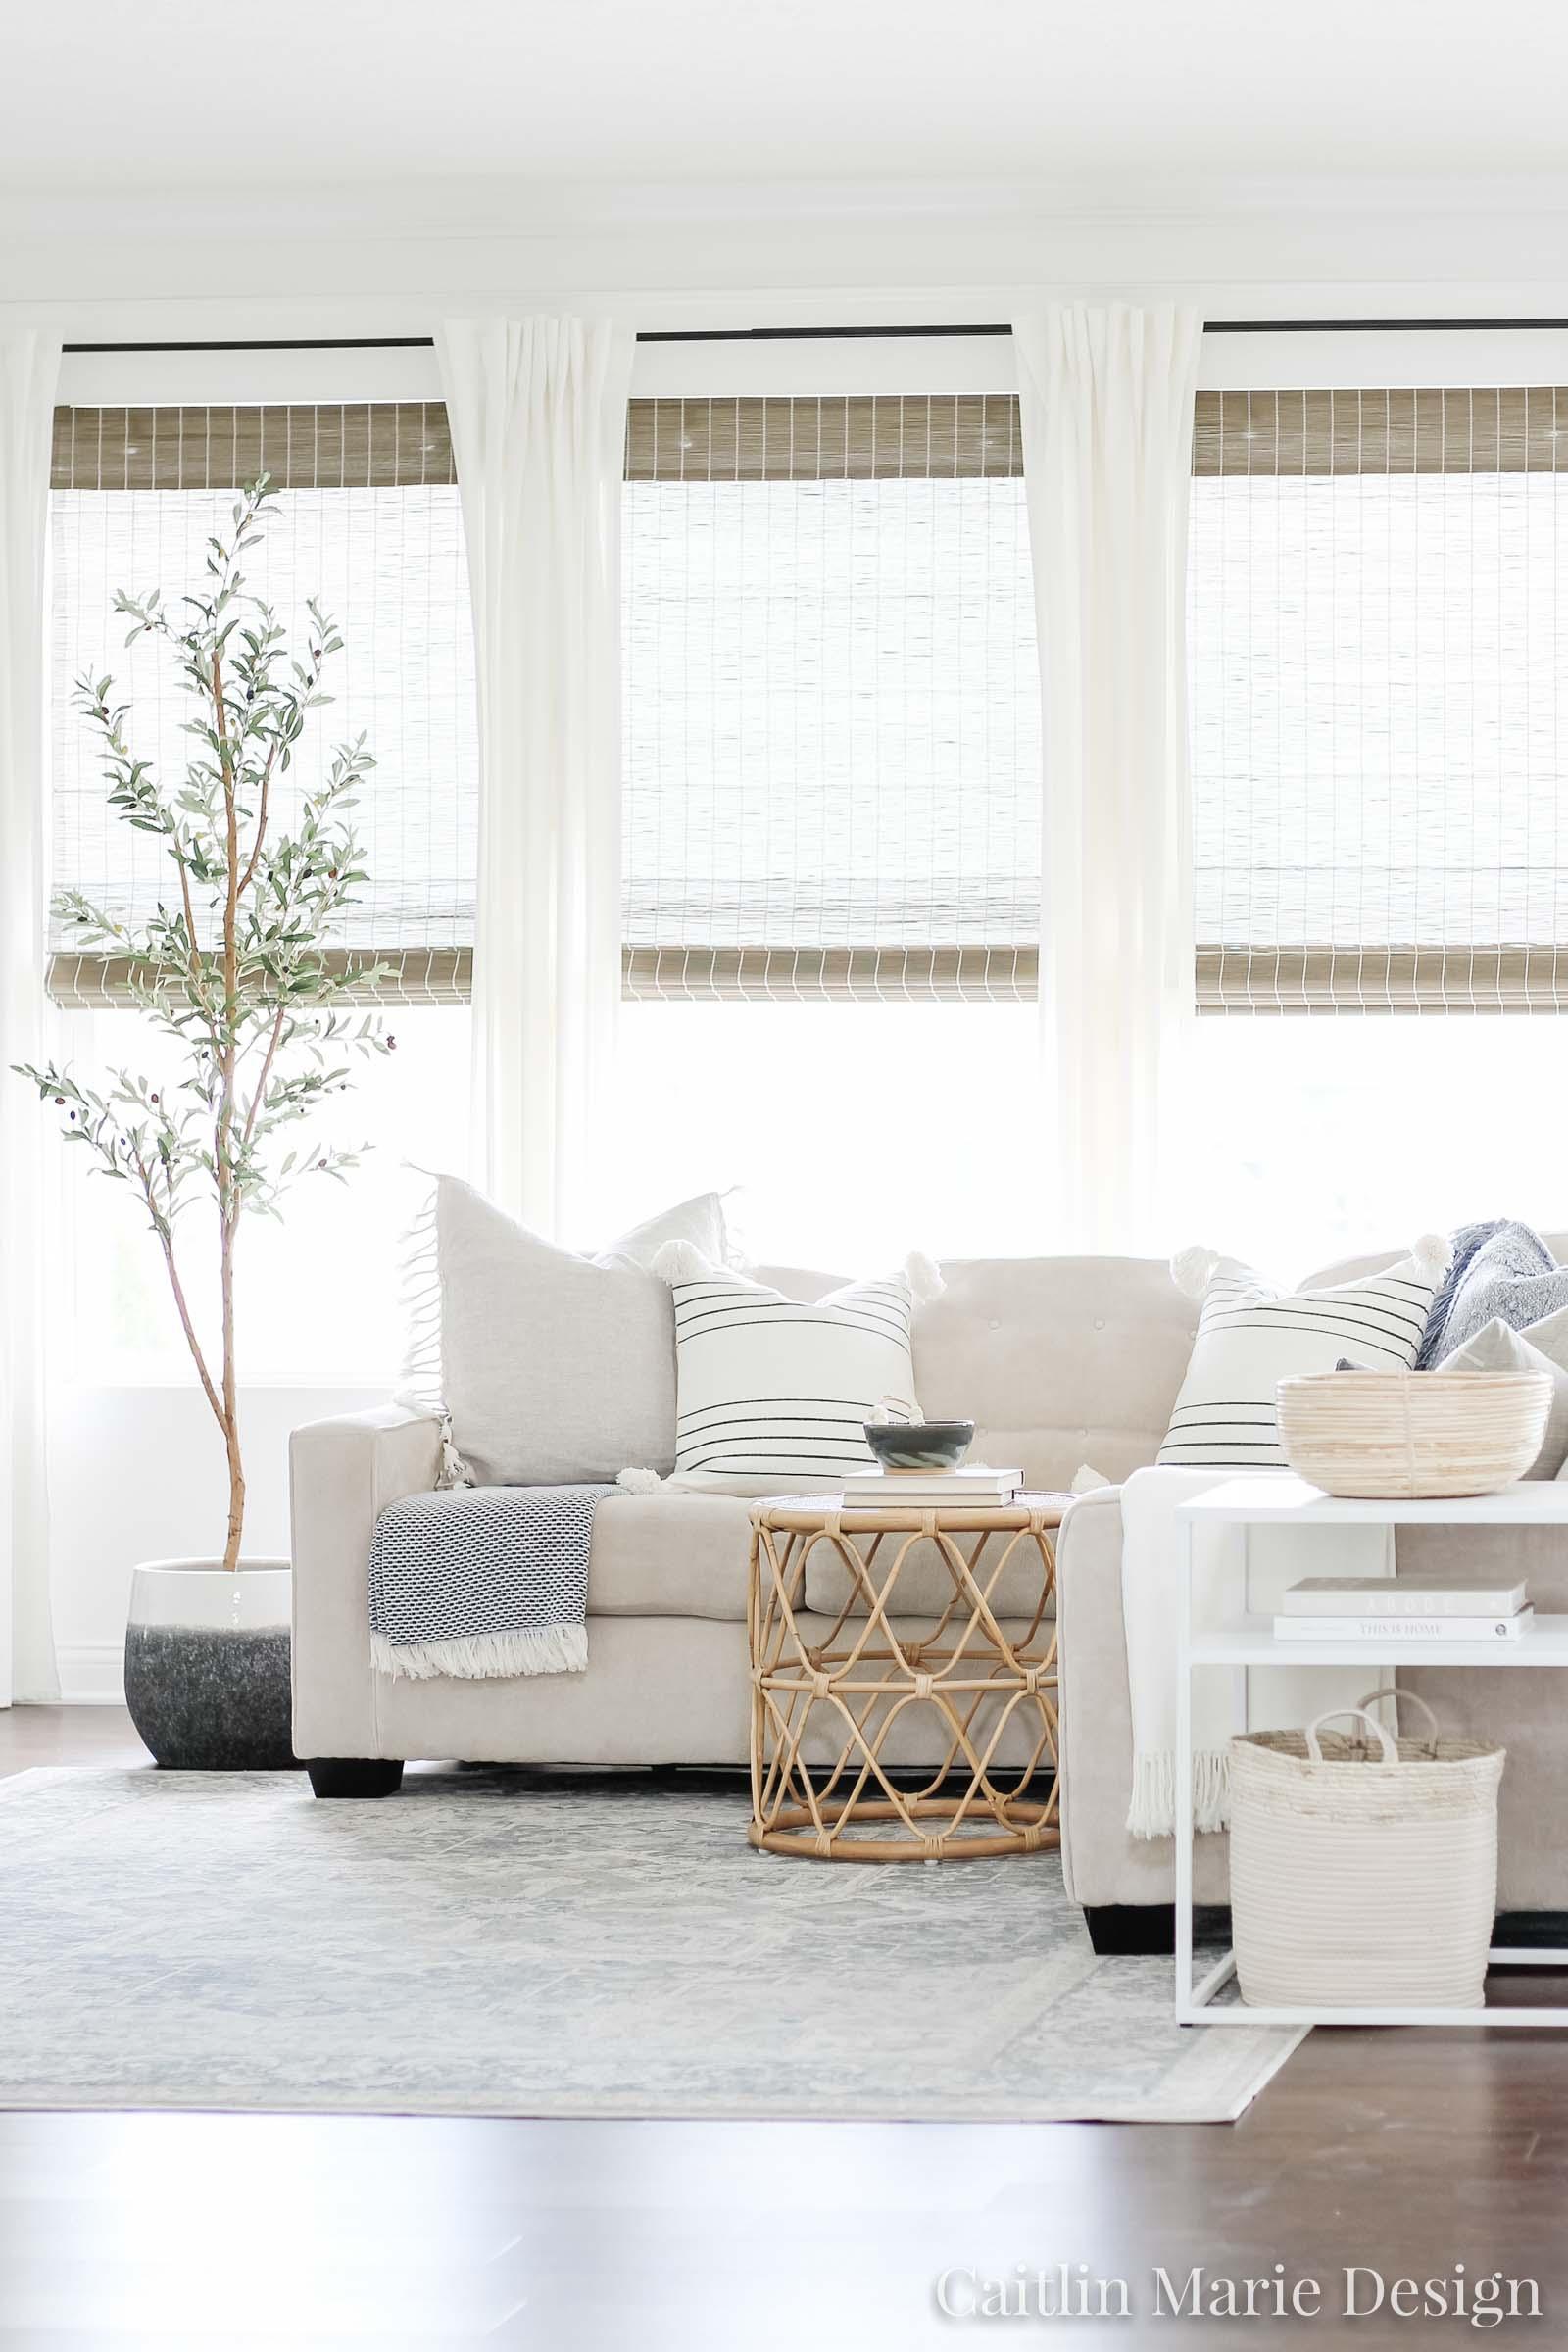 Coastal Decor Refresh with Serena & Lily | coastal living room, light and airy decor, olive tree, rattan side table, Serena & Lily pillows, coastal decor